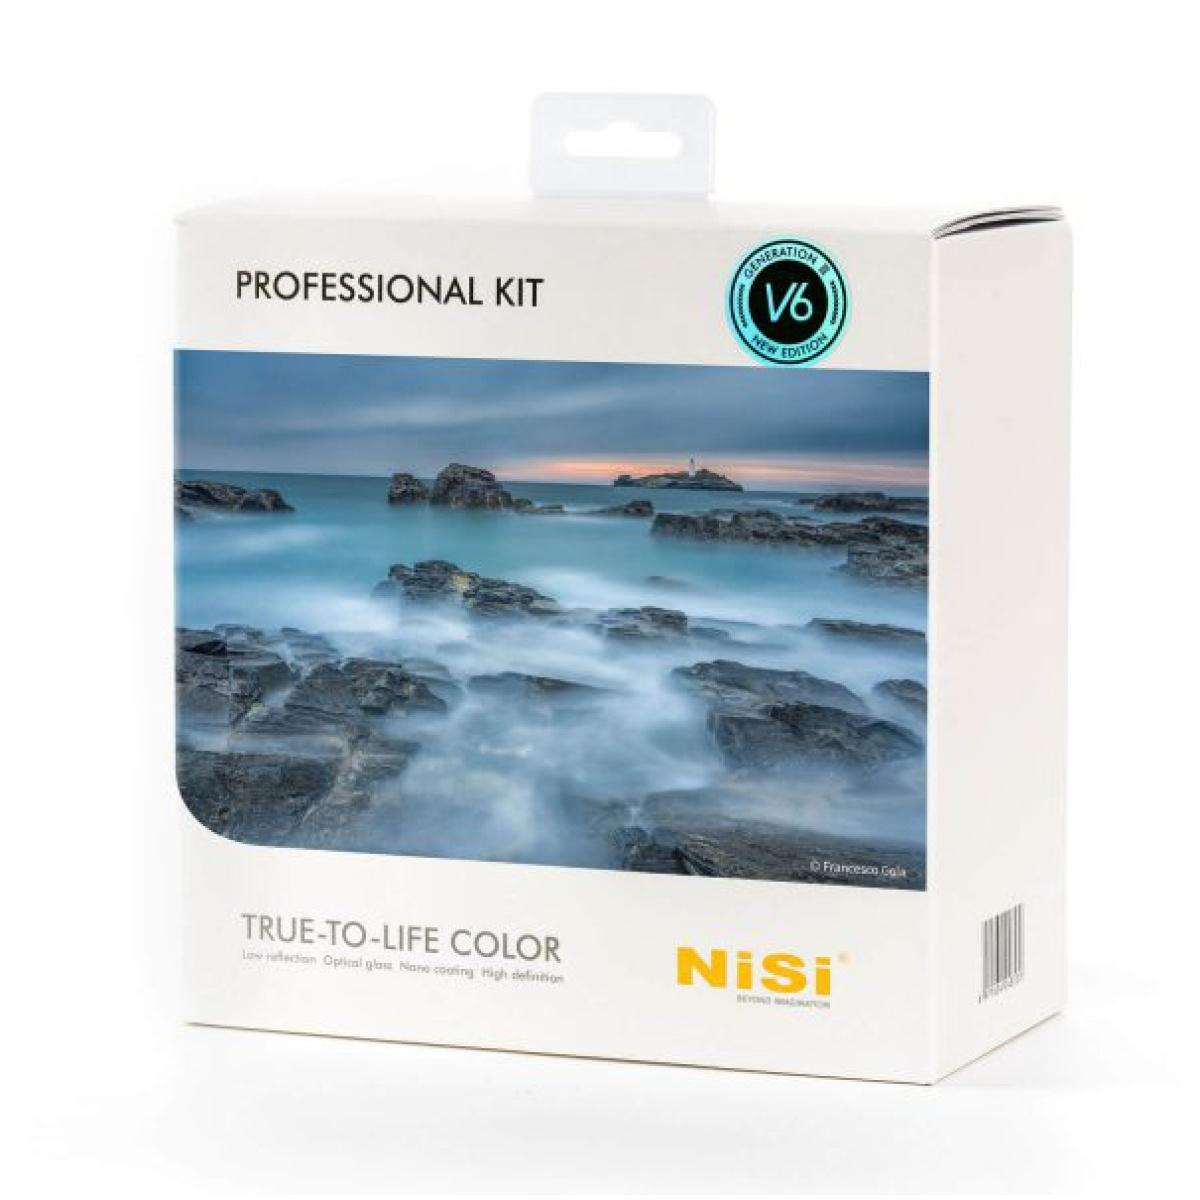 NiSi Professional Kit V6 (Serie III)